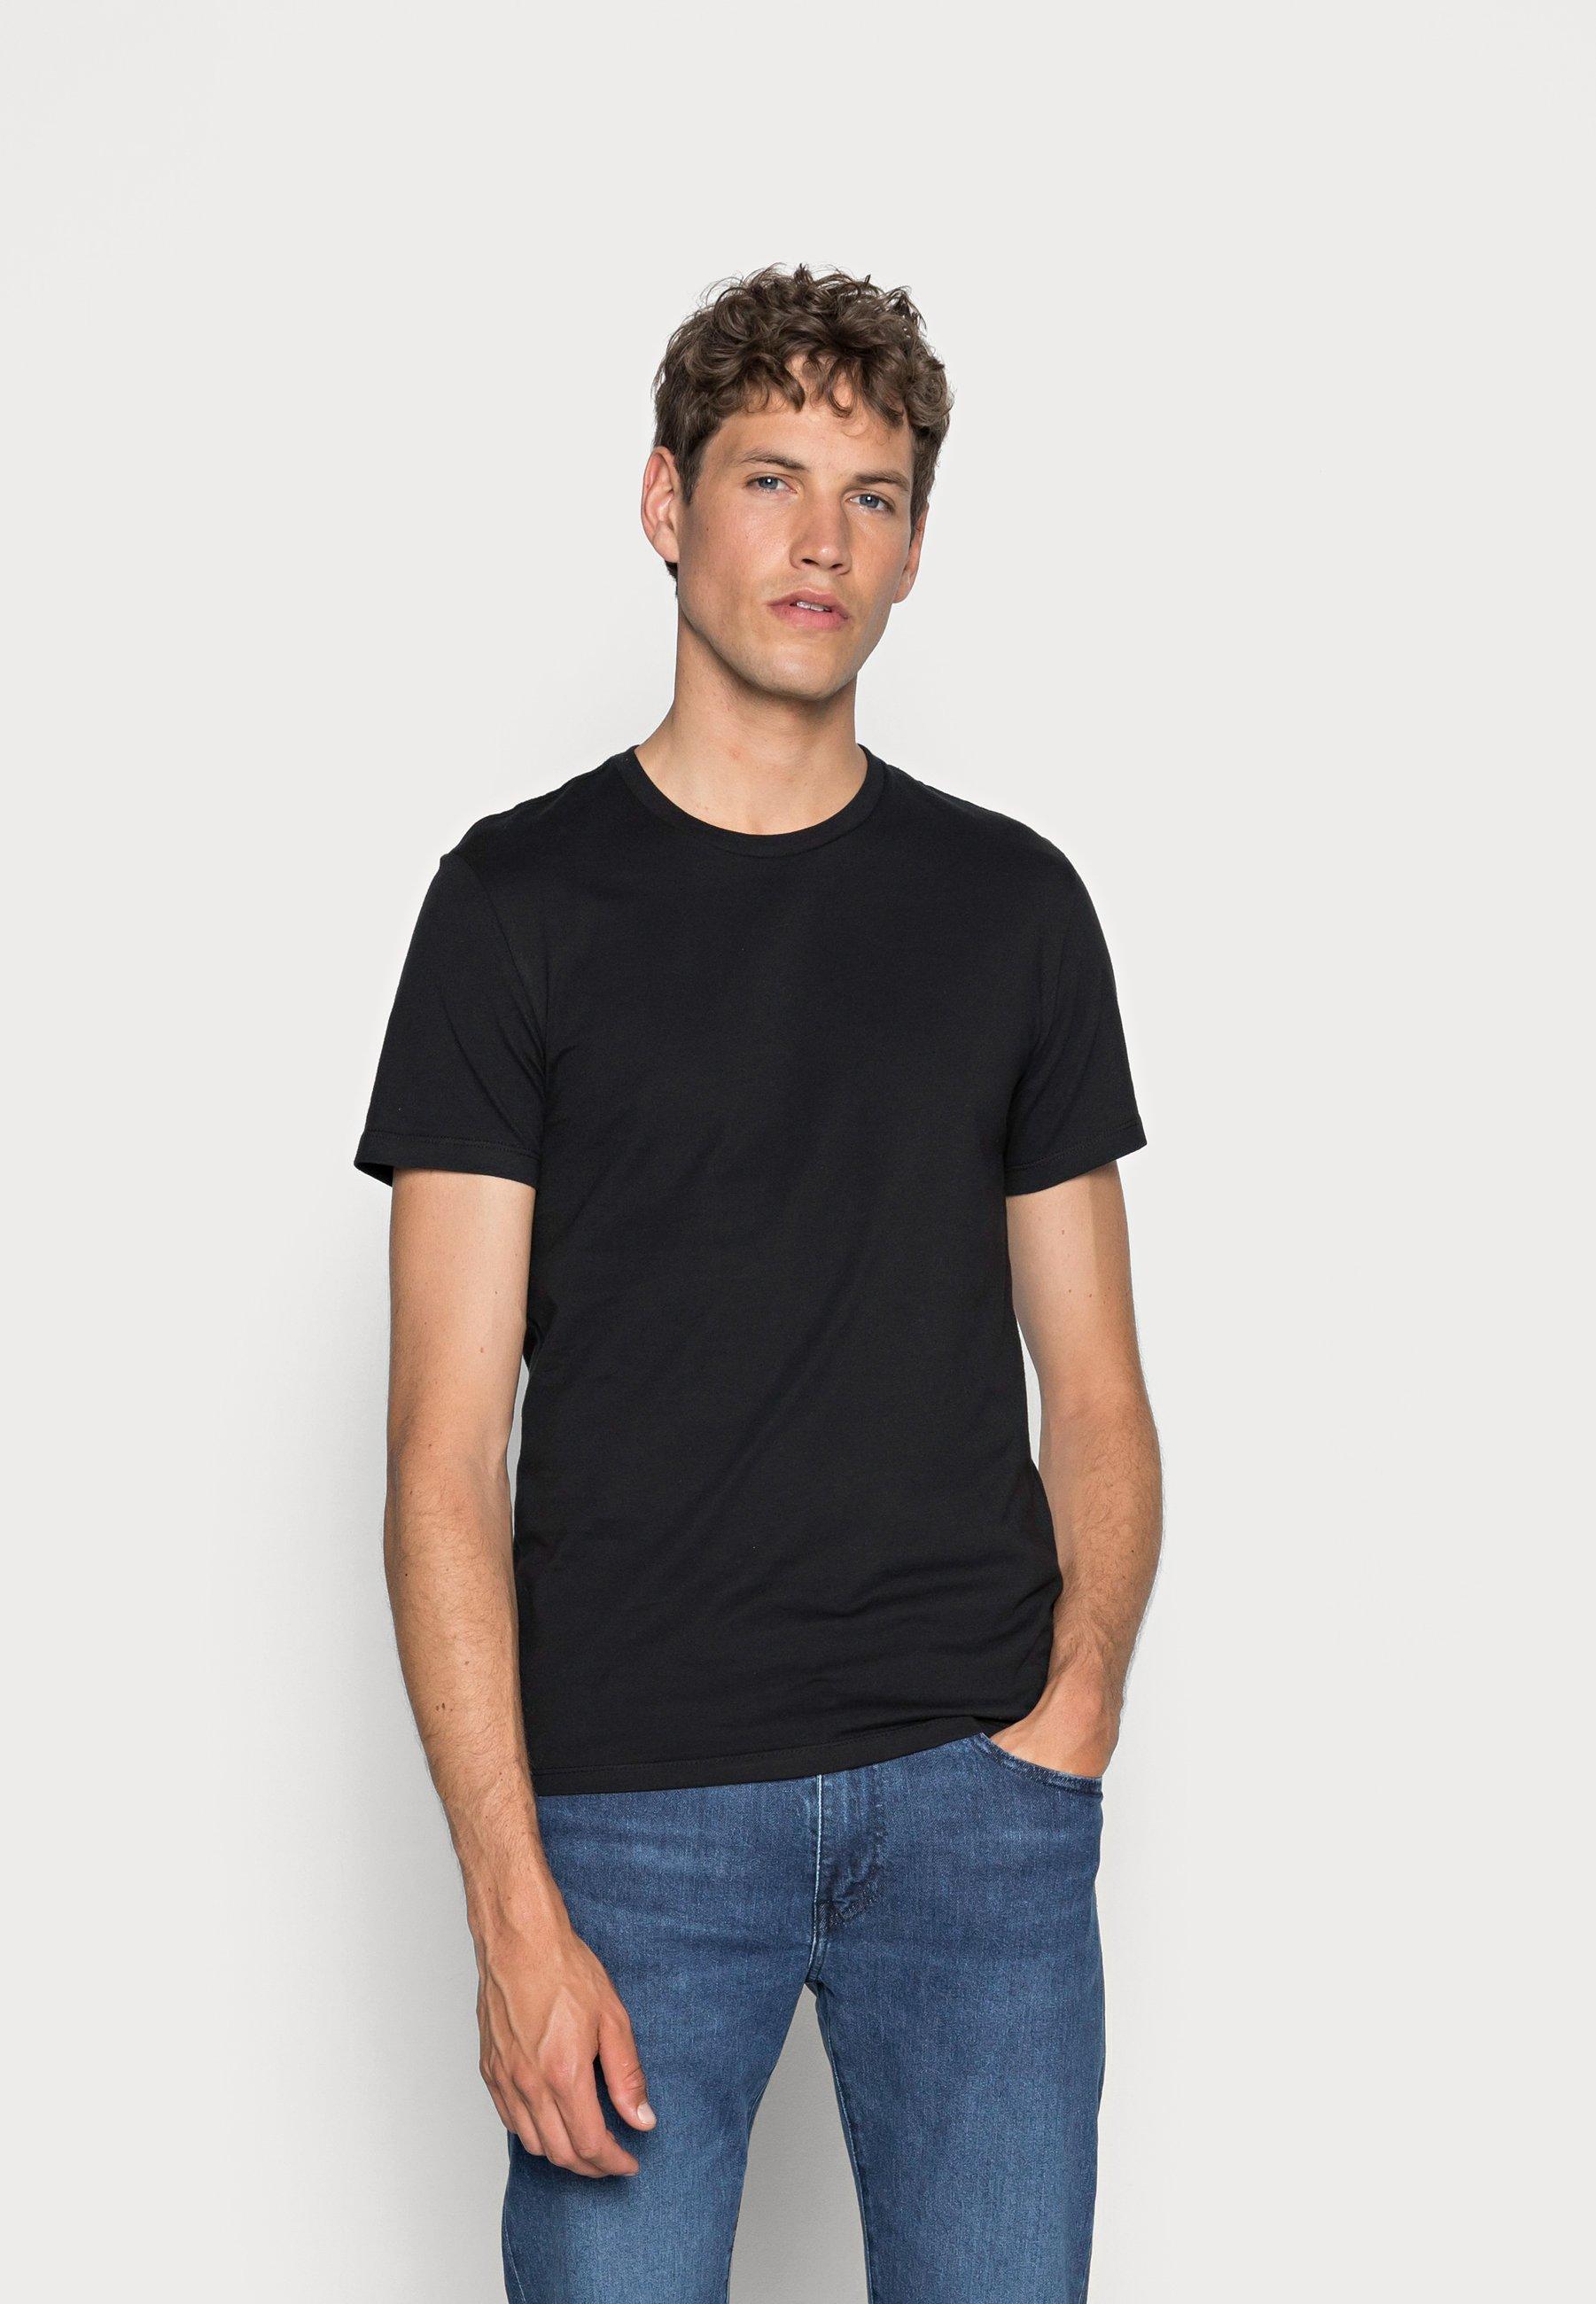 Homme SLIM CREWNECK 2 PACK - T-shirt basique - black